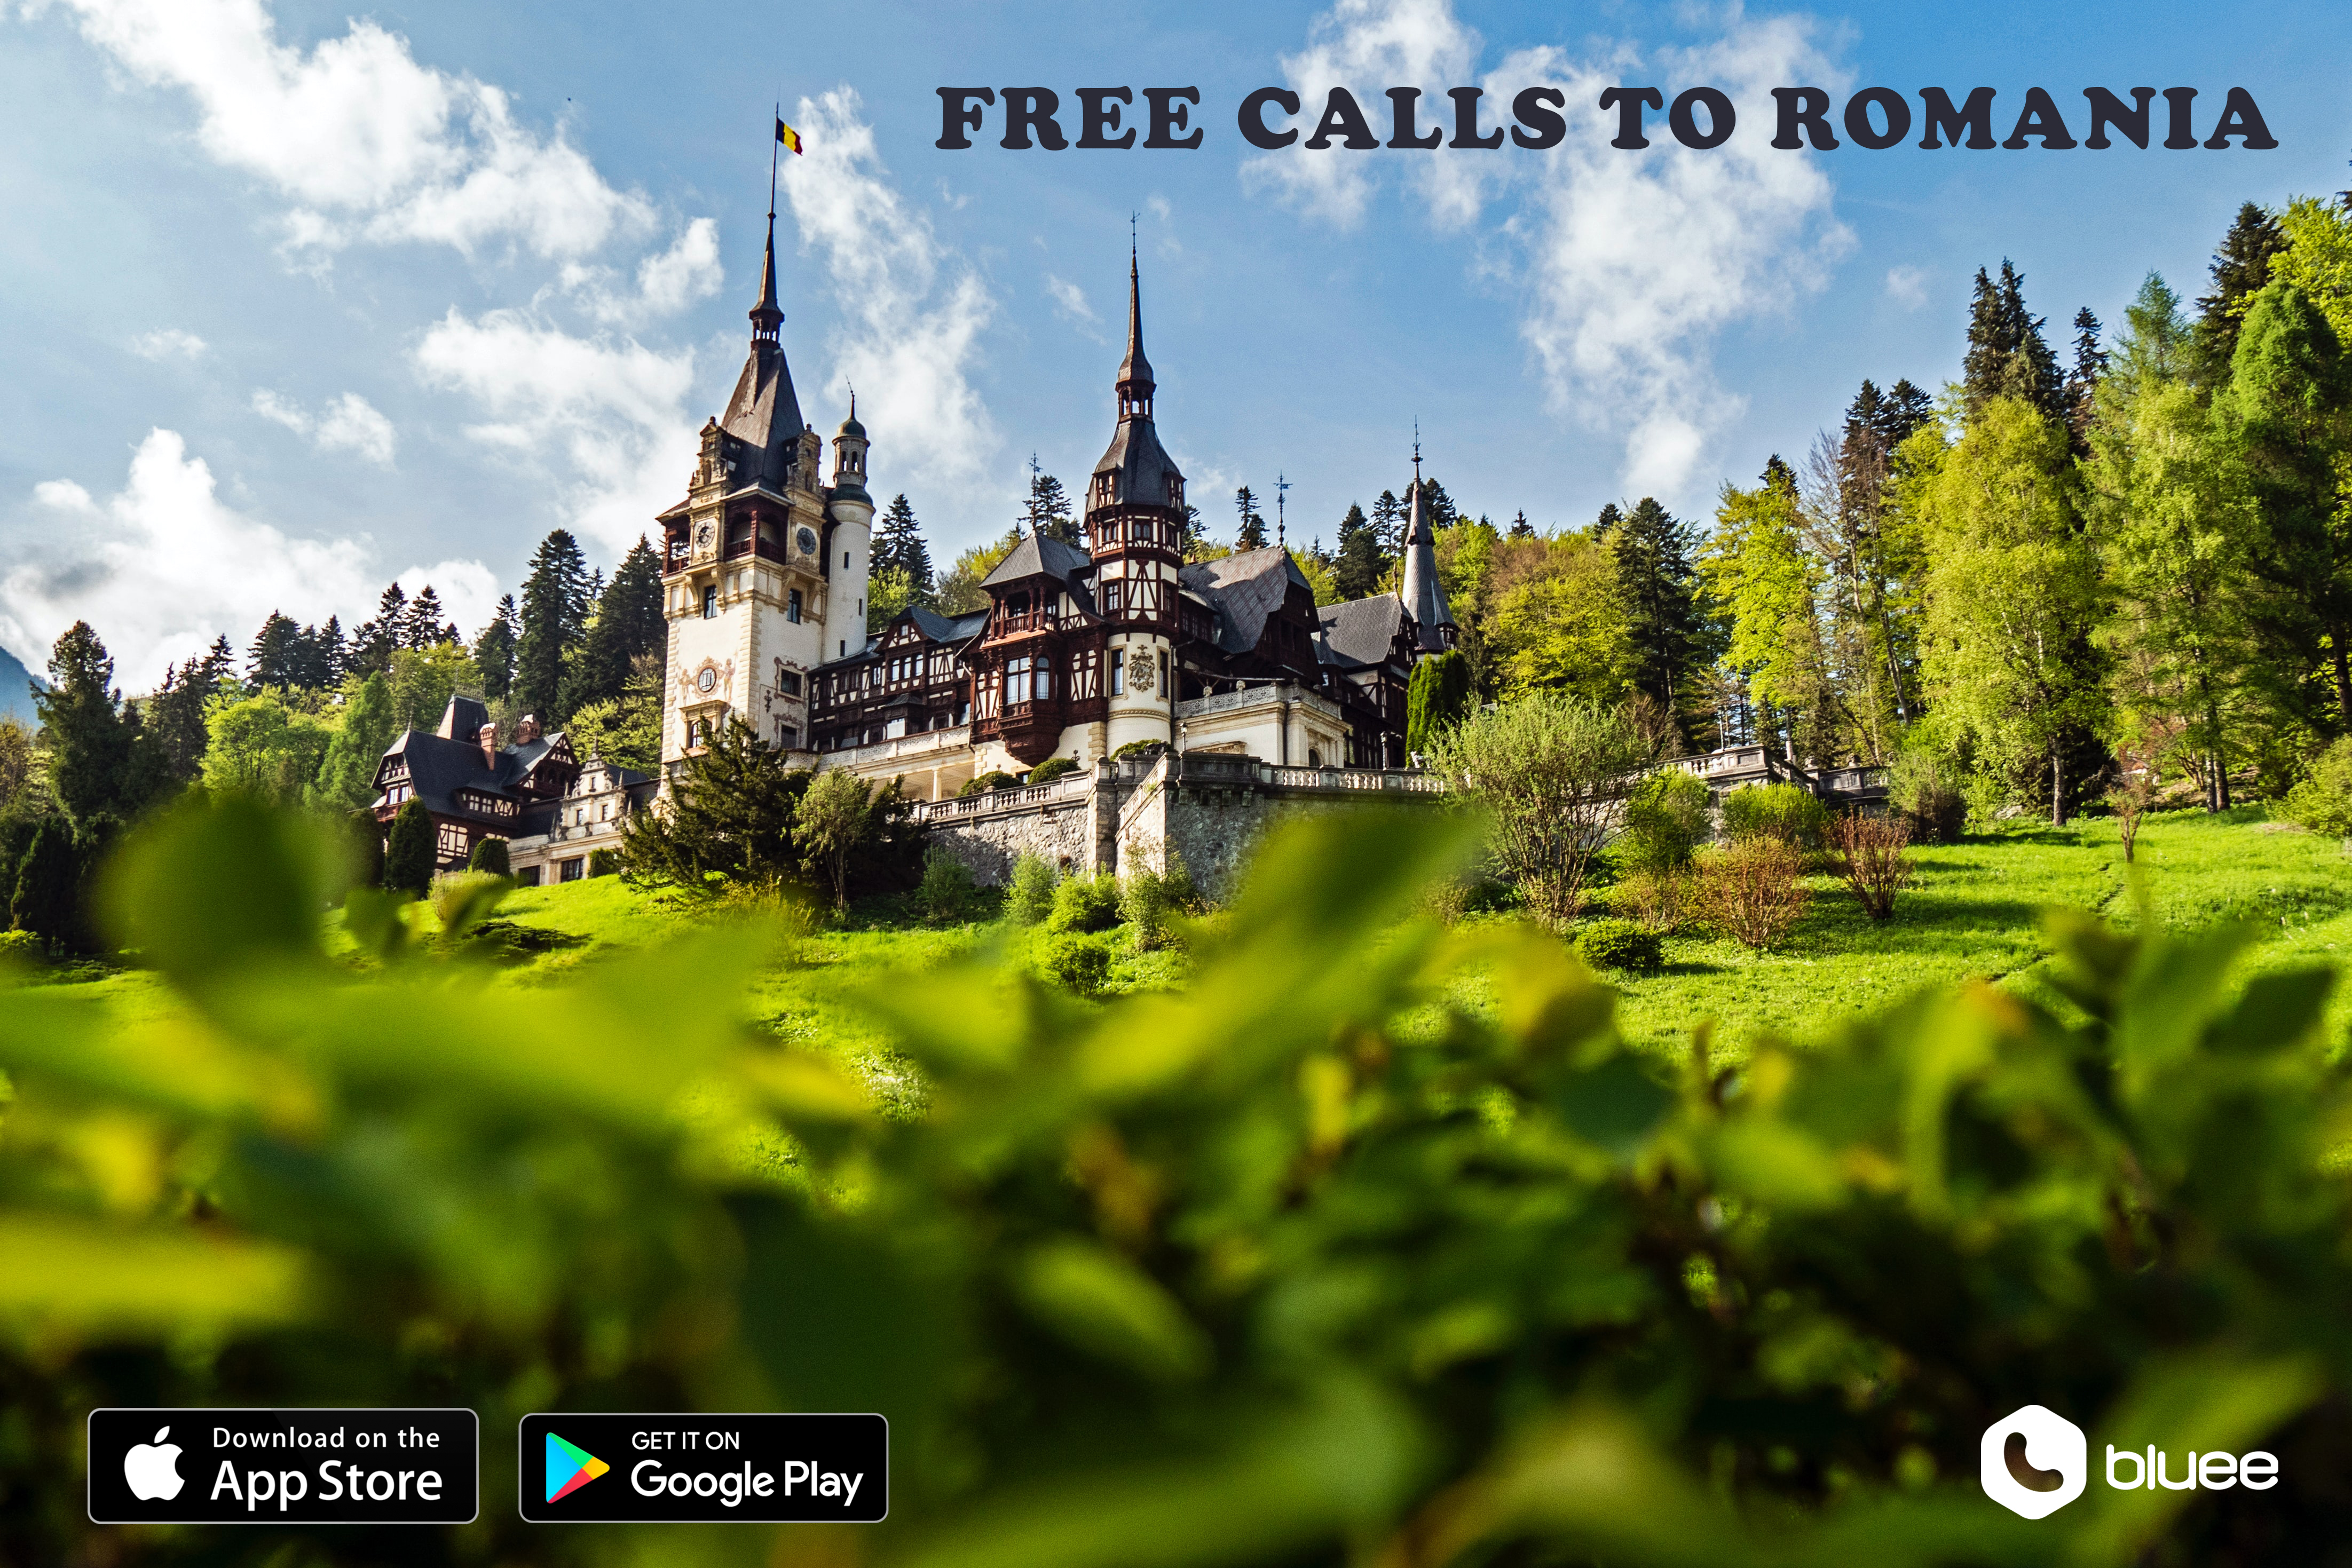 Free Calls to Romania